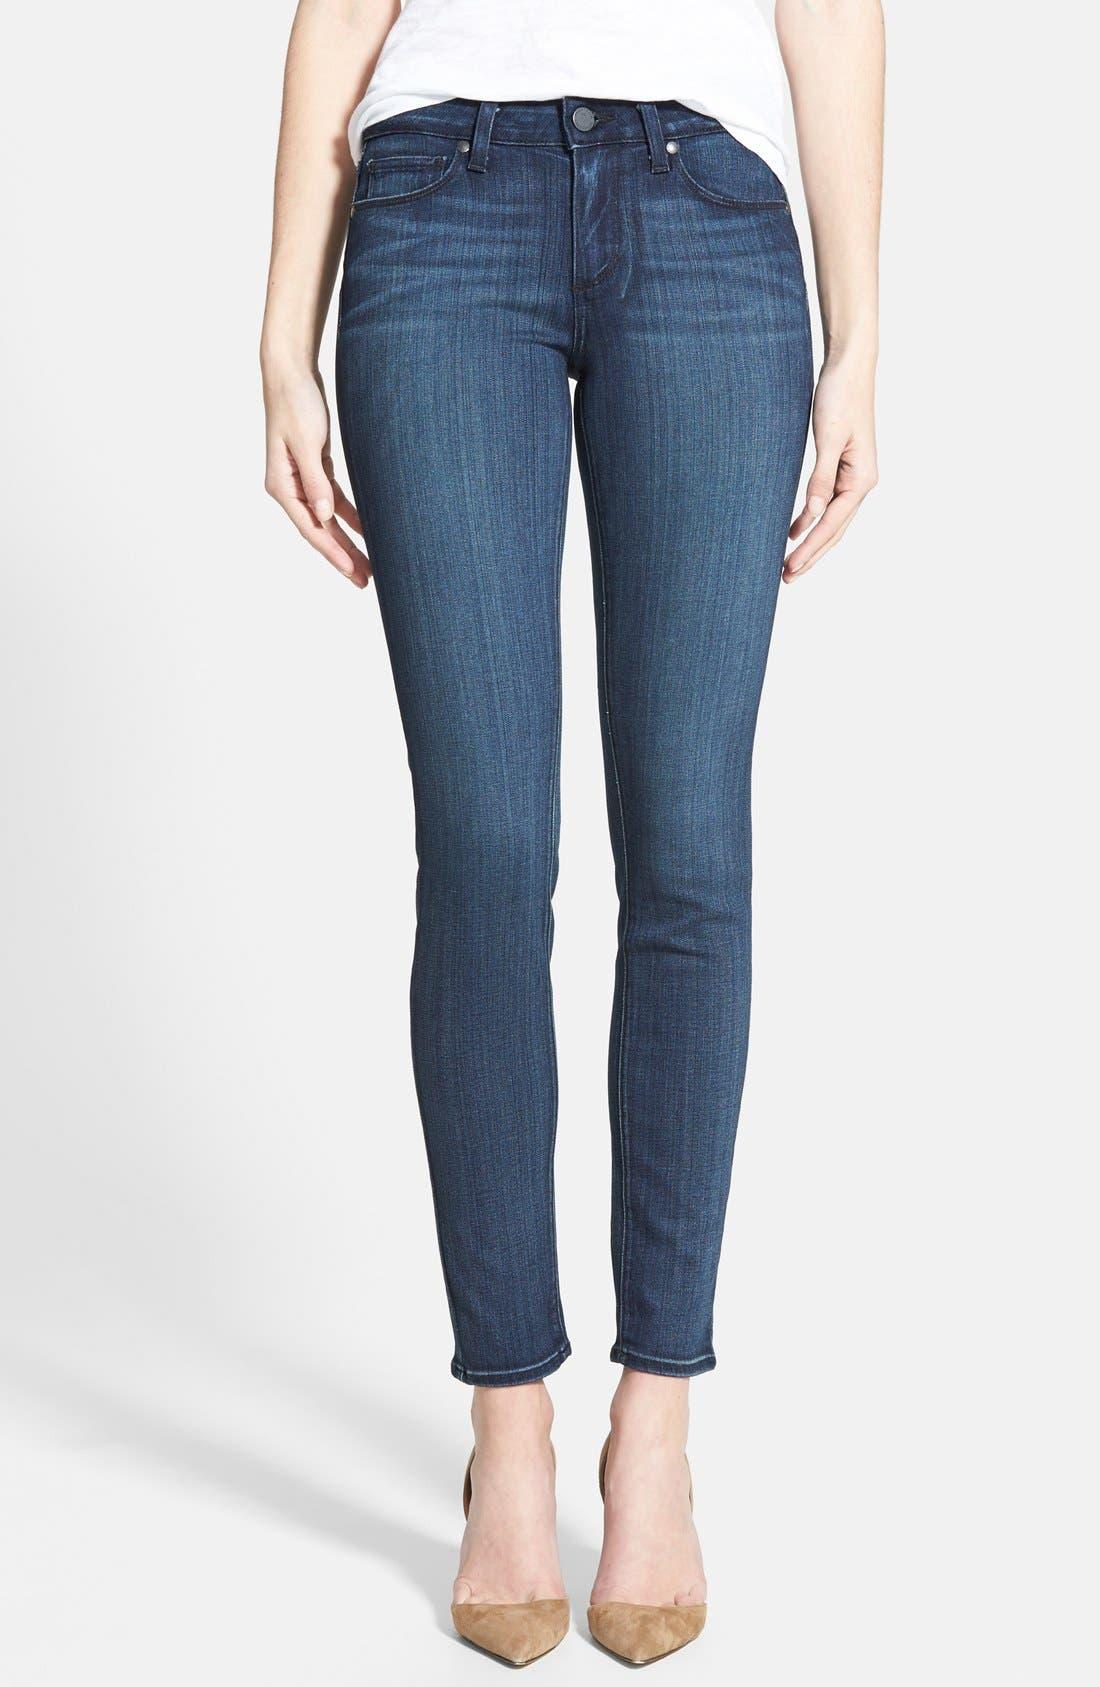 Alternate Image 1 Selected - Paige Denim 'Transcend - Verdugo' Ultra Skinny Jeans (Valor)